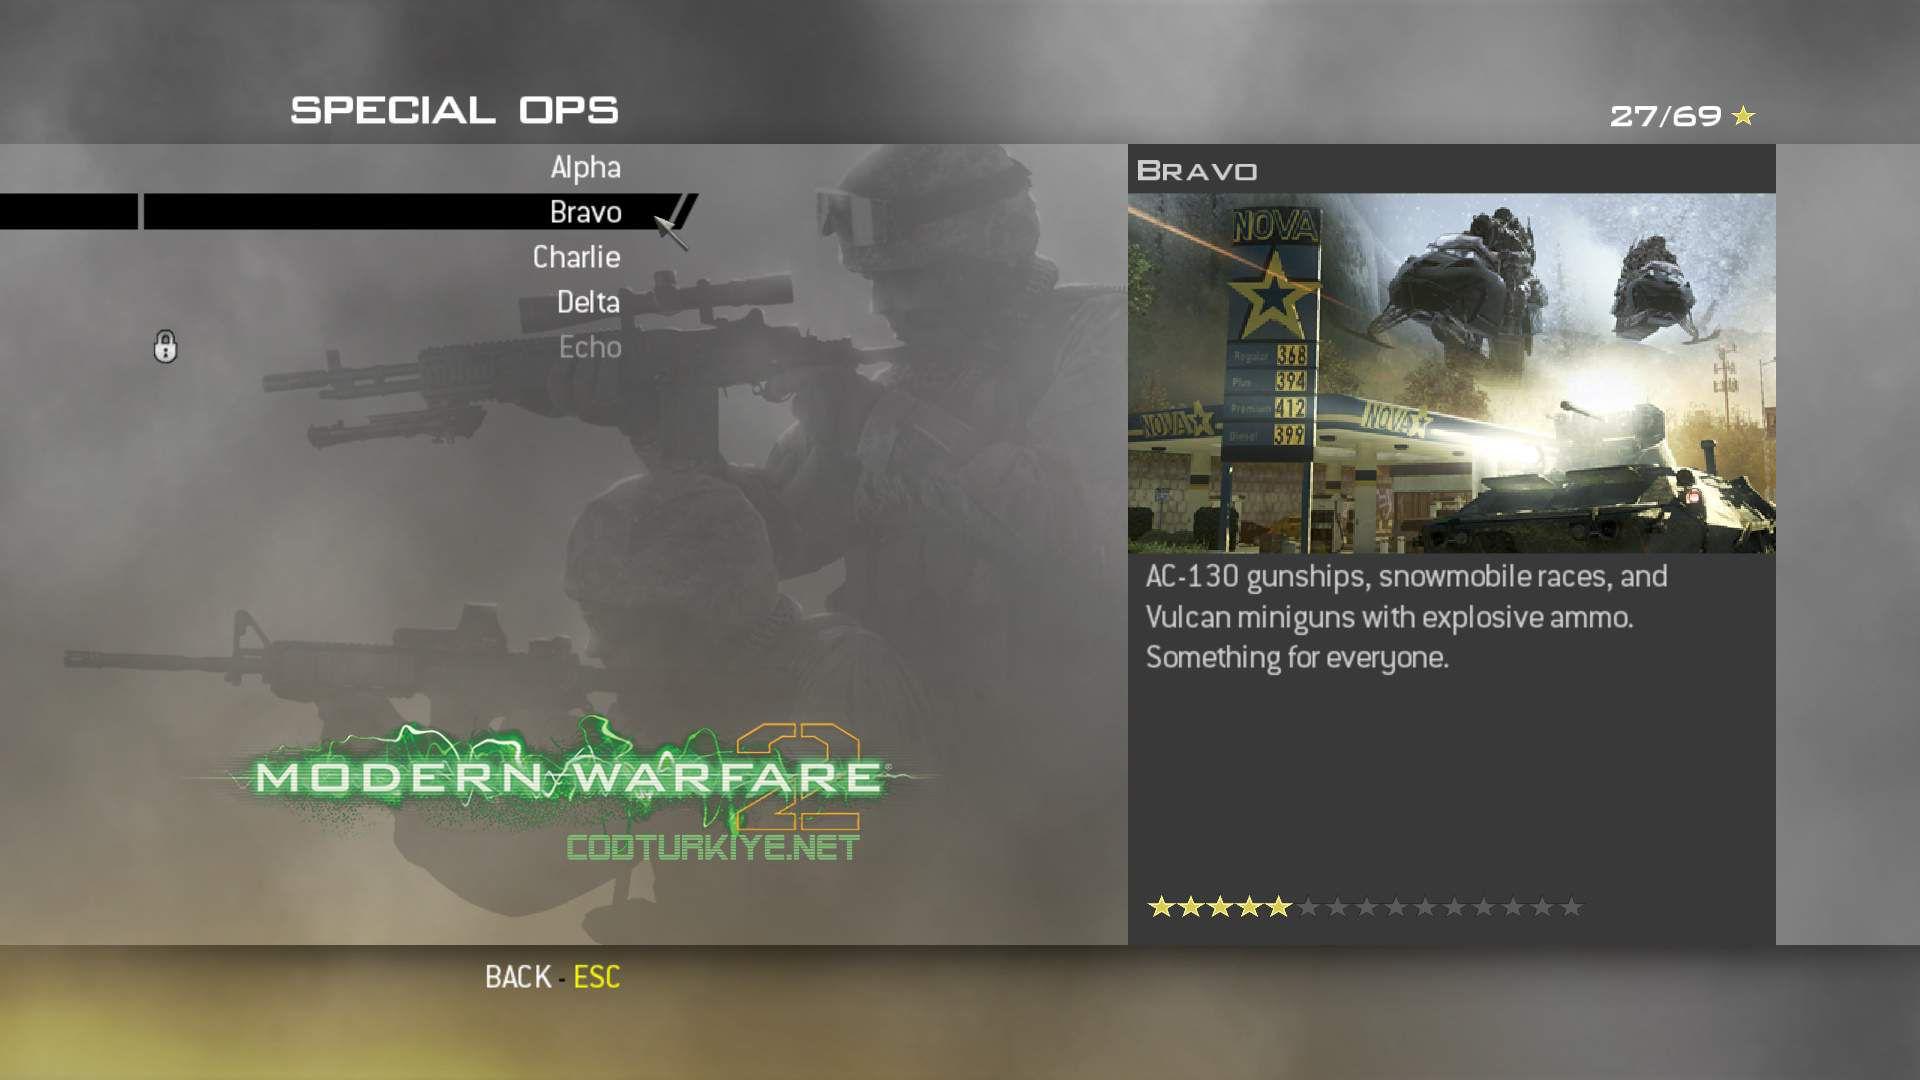 Call of Duty Modern Warfare 2 Special Ops Bravo Görevleri